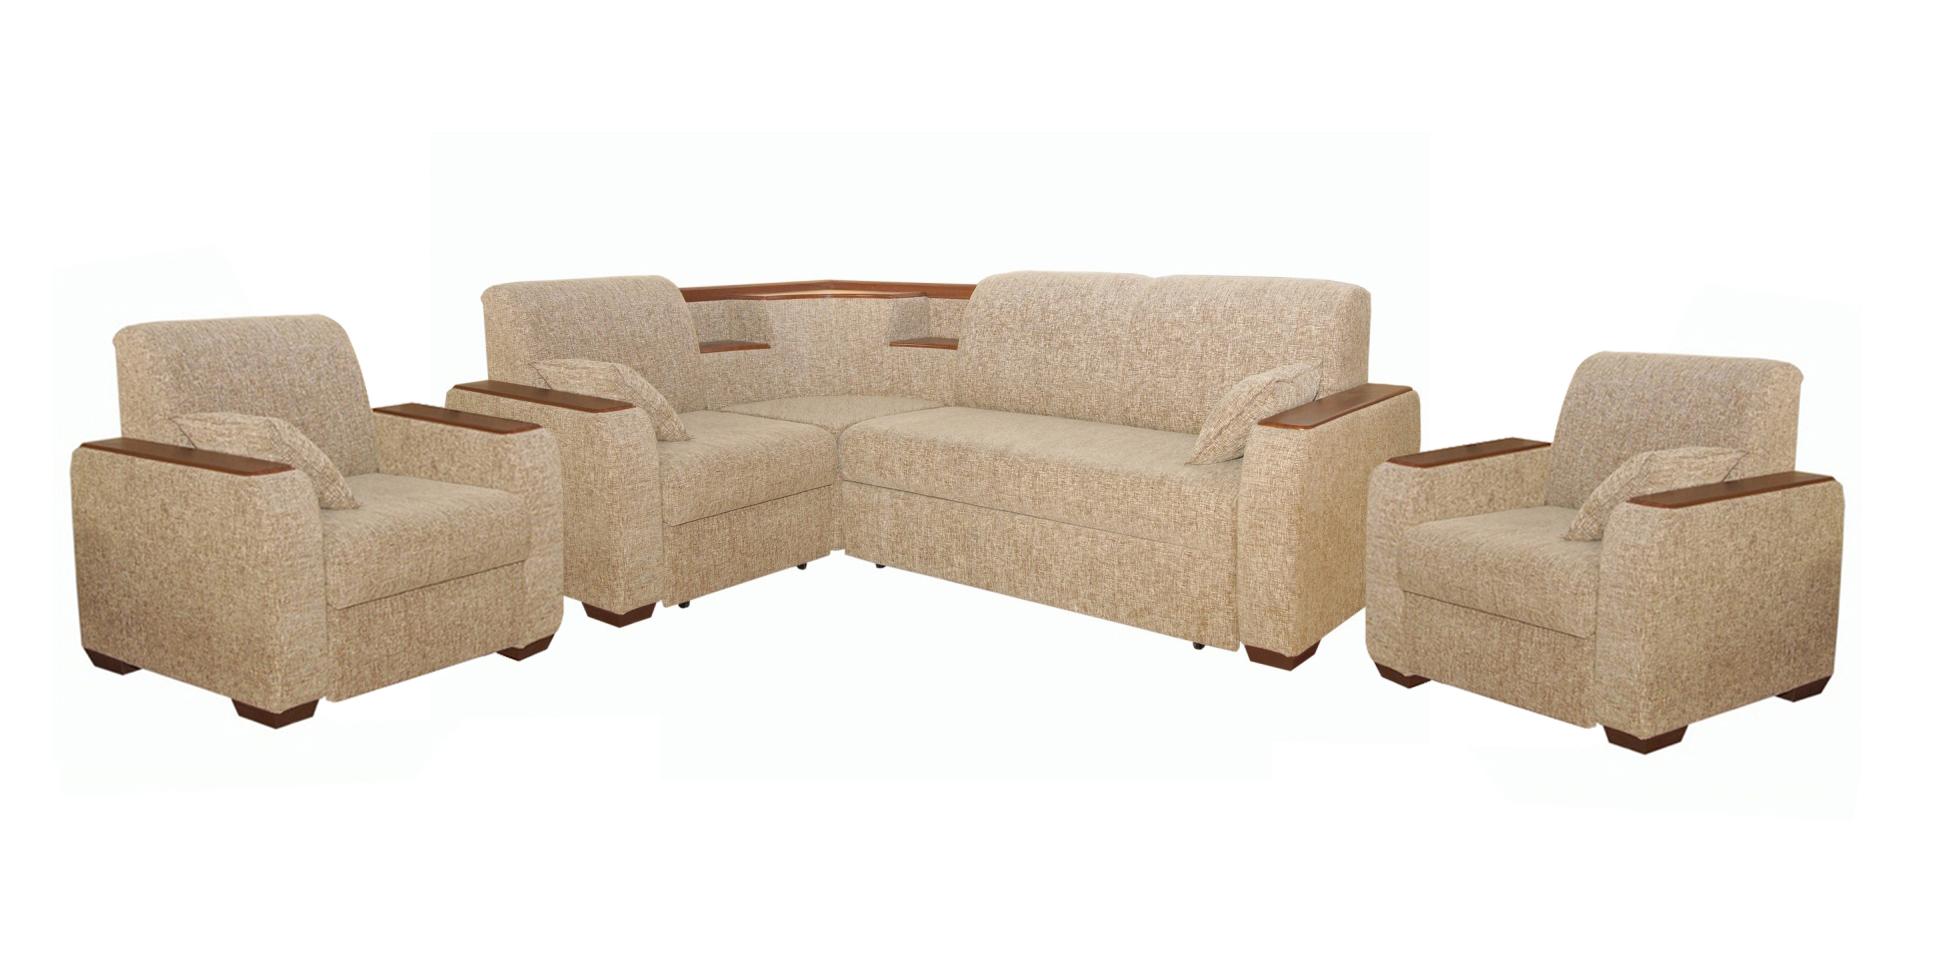 Комплект мягкой мебели Челси-1 фото